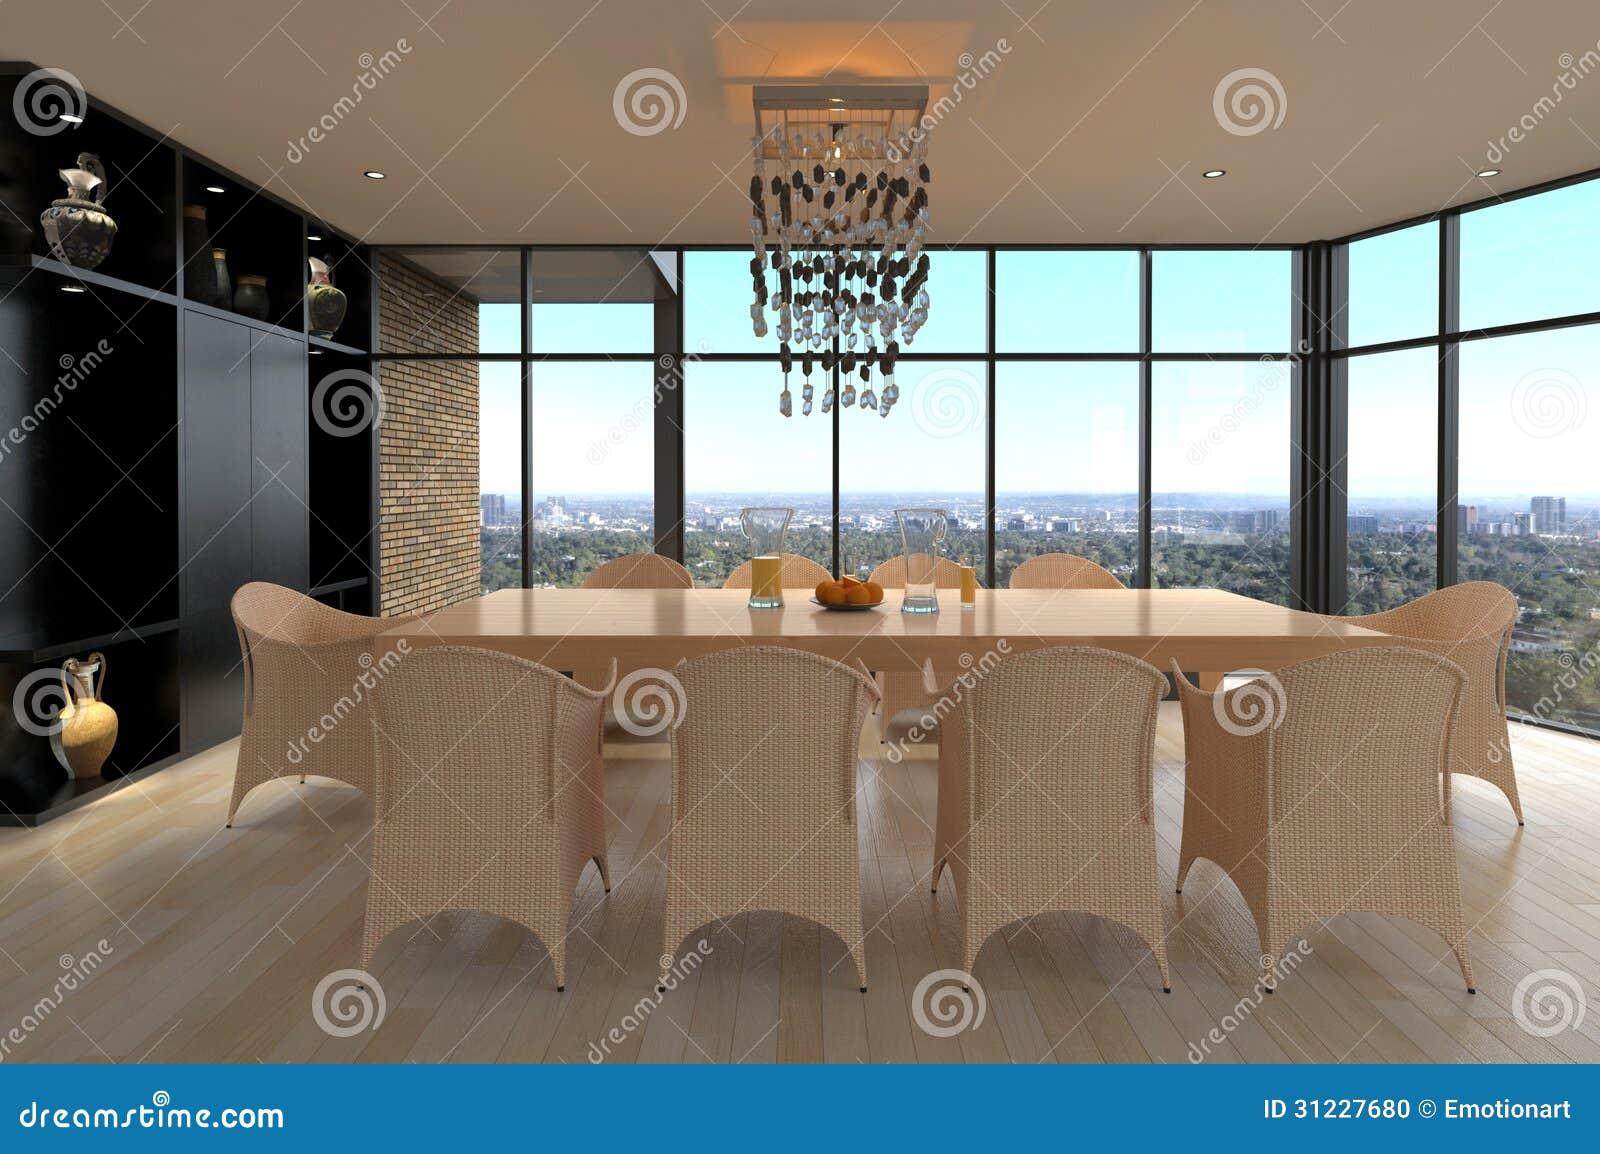 Comedor del dise o moderno interior de la sala de estar for Estar comedor disenos